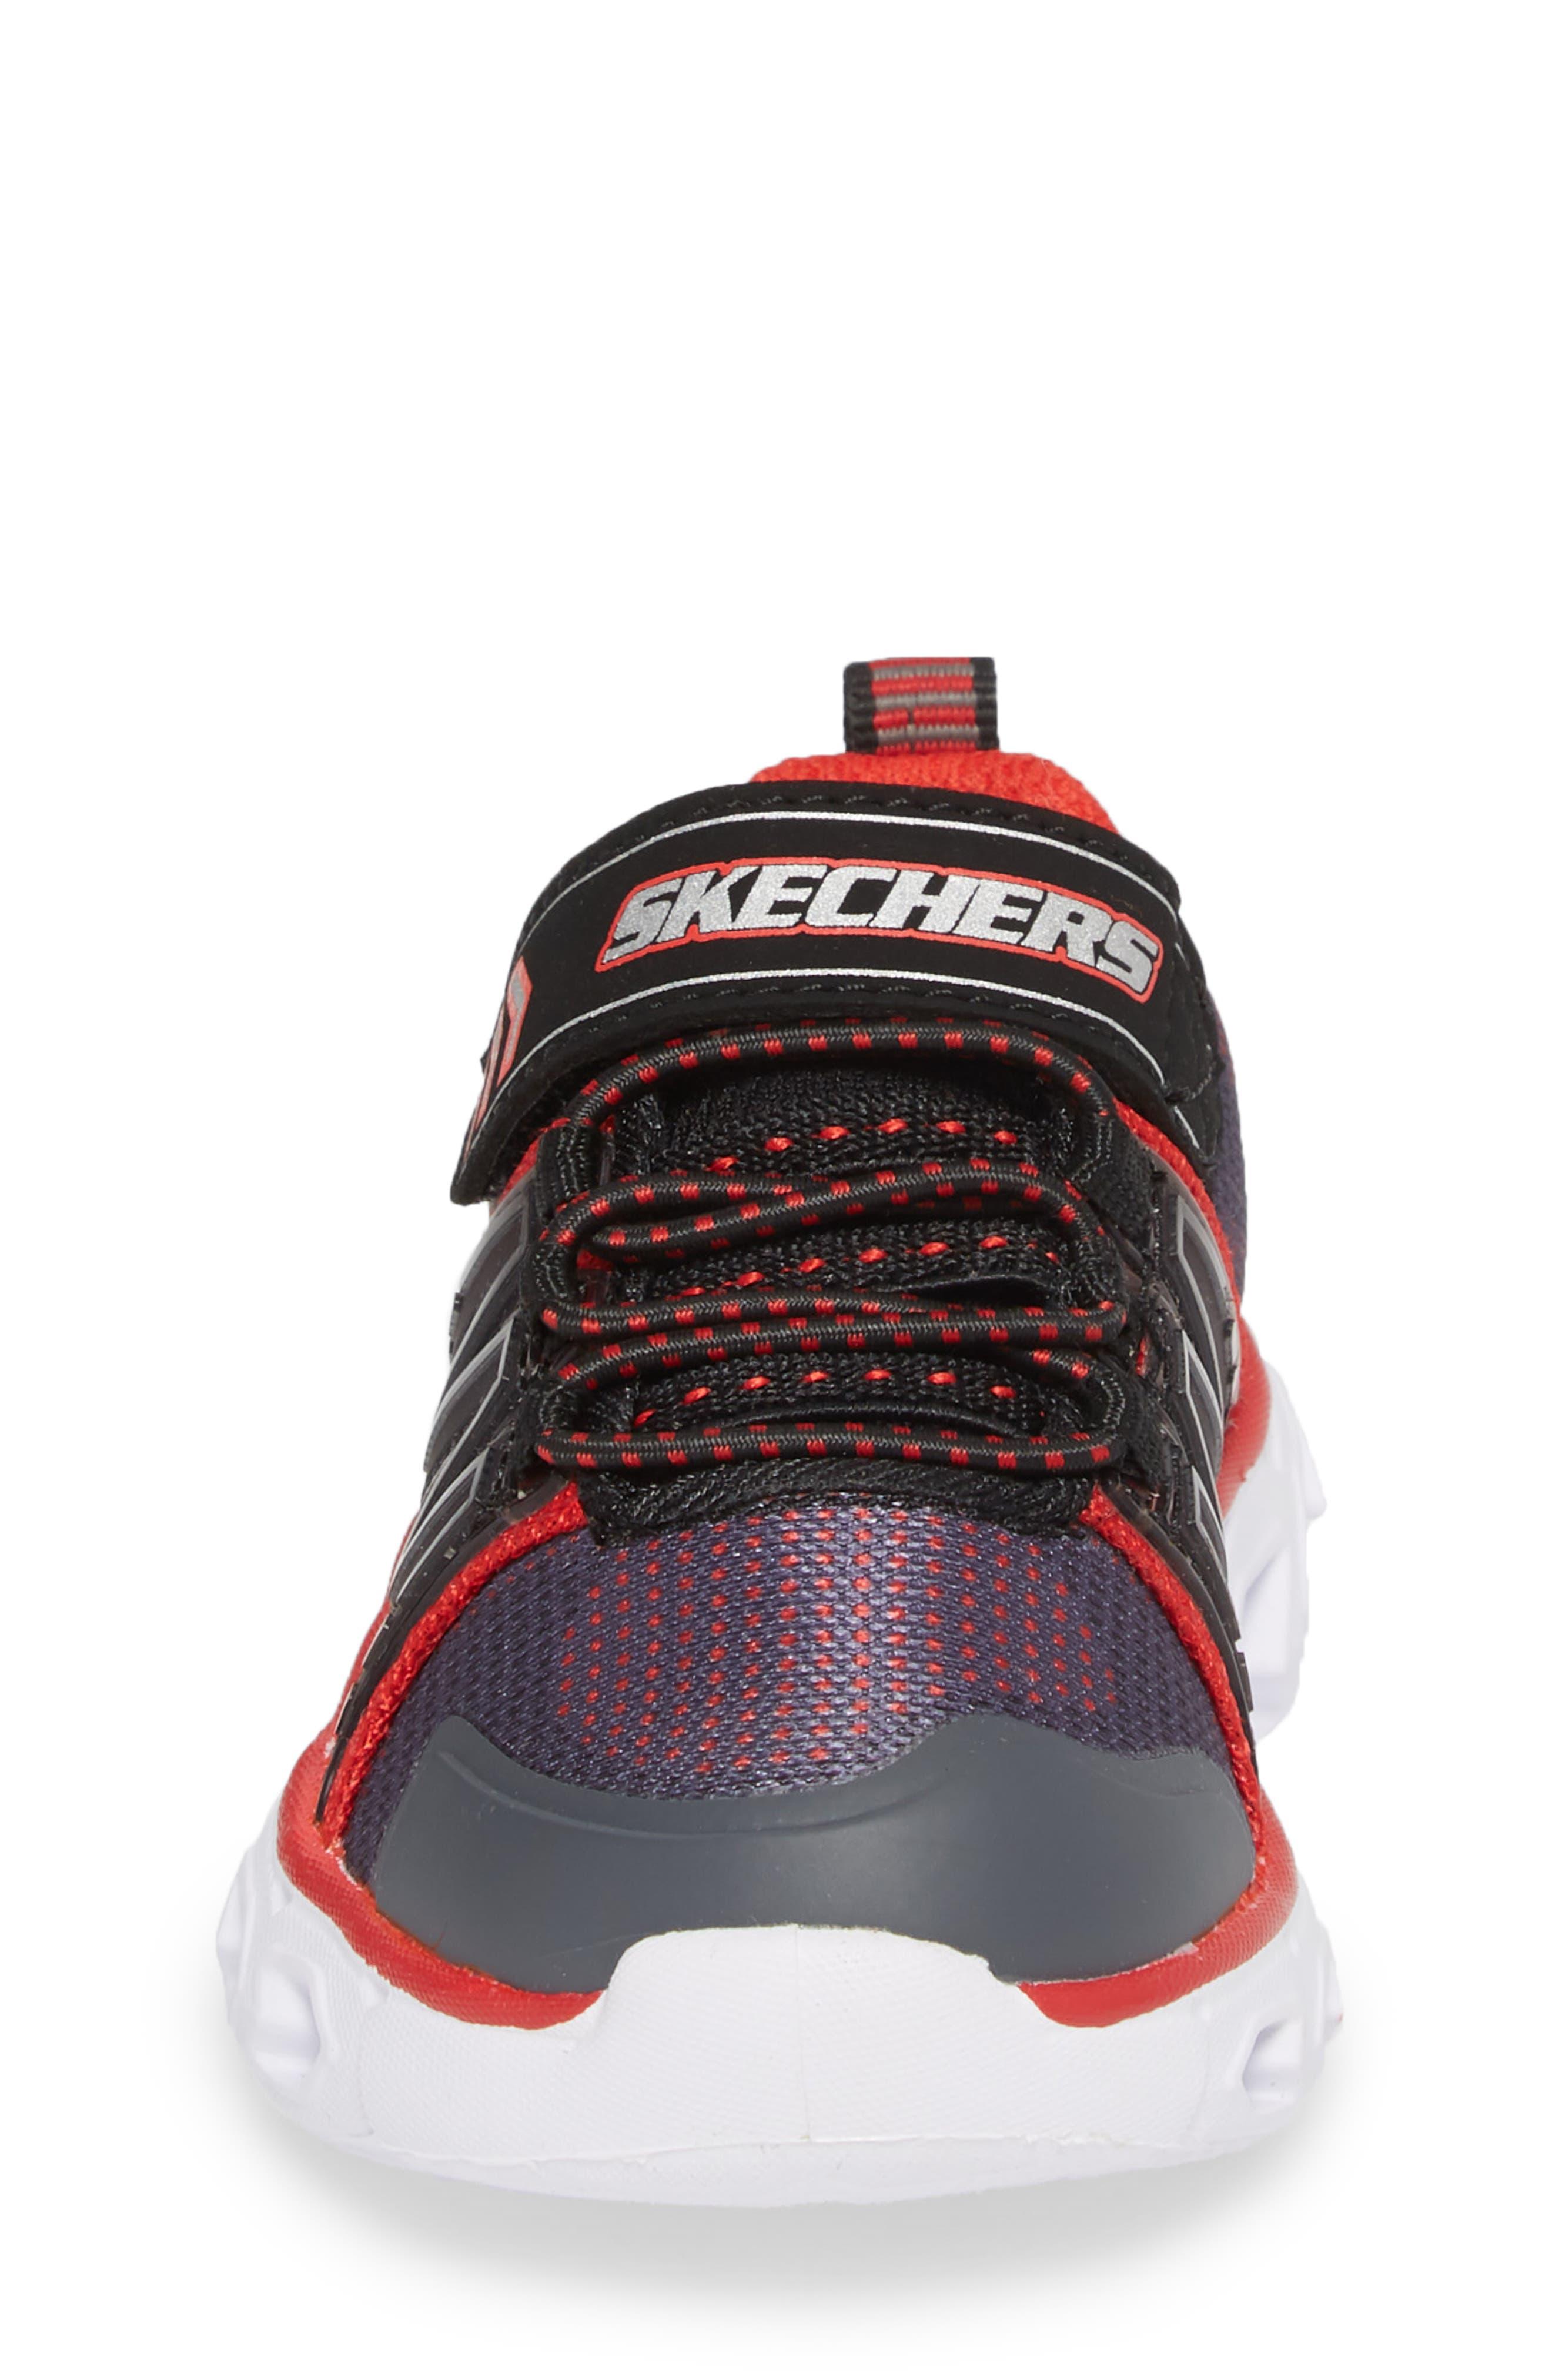 Hypno-Flash 2.0 Sneakers,                             Alternate thumbnail 8, color,